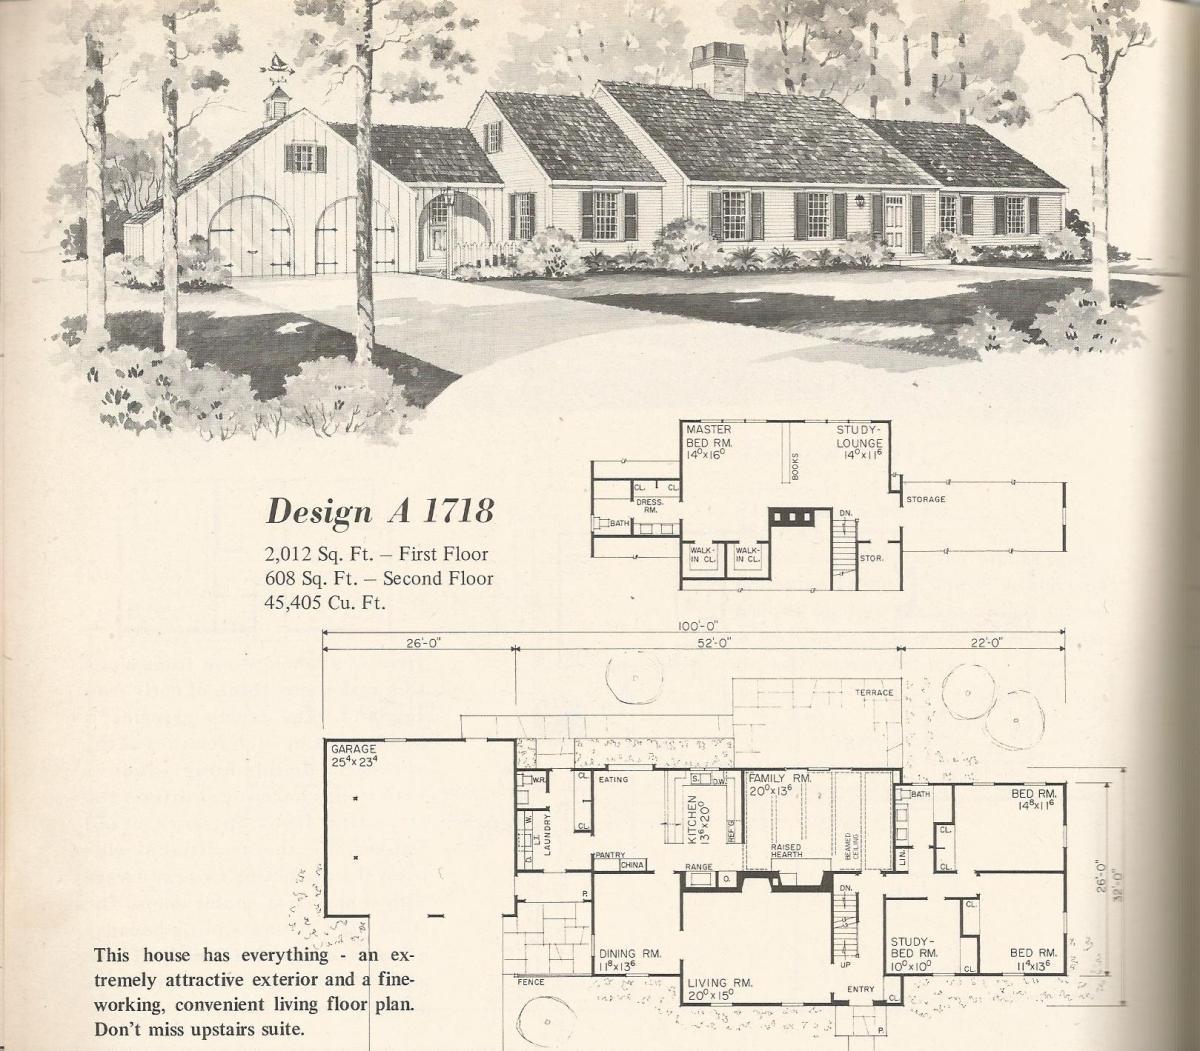 Vintage Home Plans, country estates